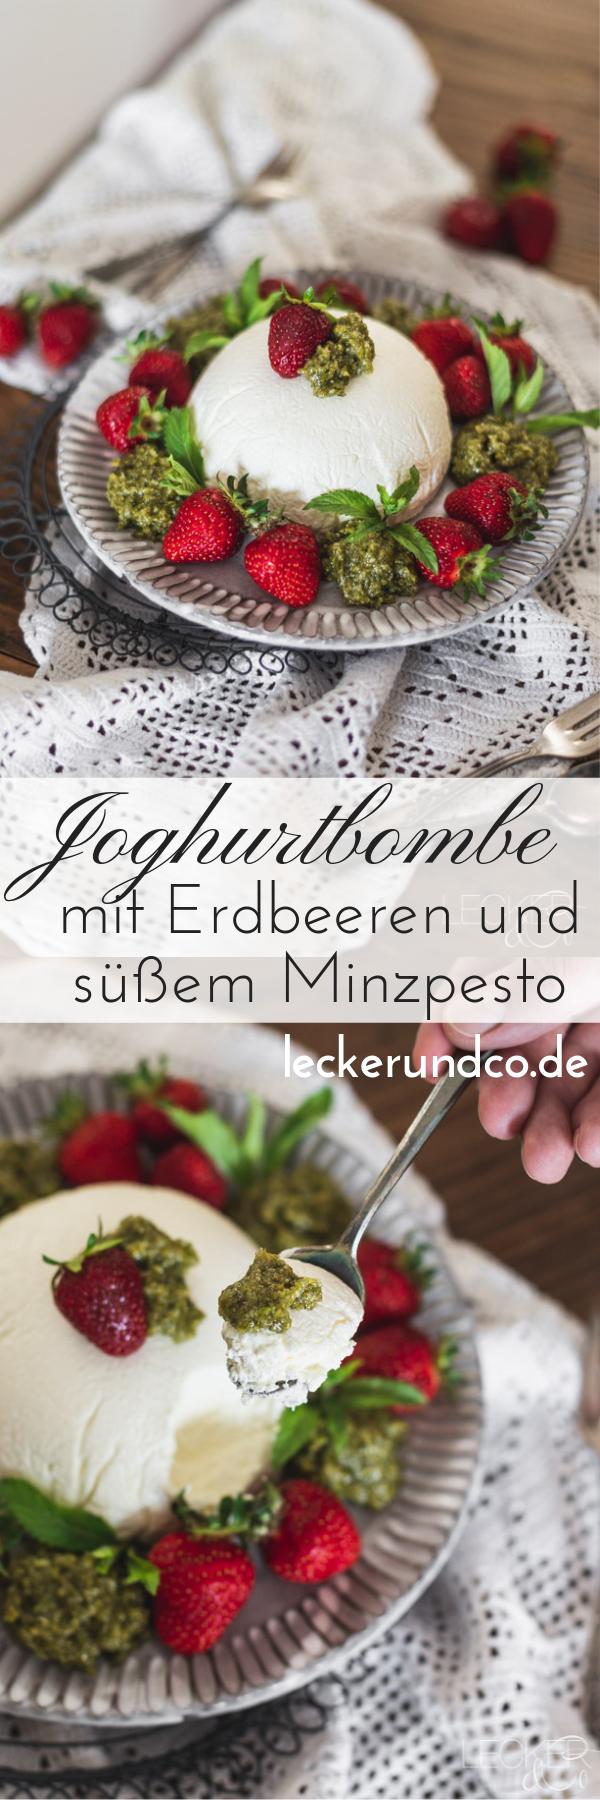 Photo of Yogurt bomb with strawberries and sweet mint pesto LECKER & Co | Food blog from Nuremberg